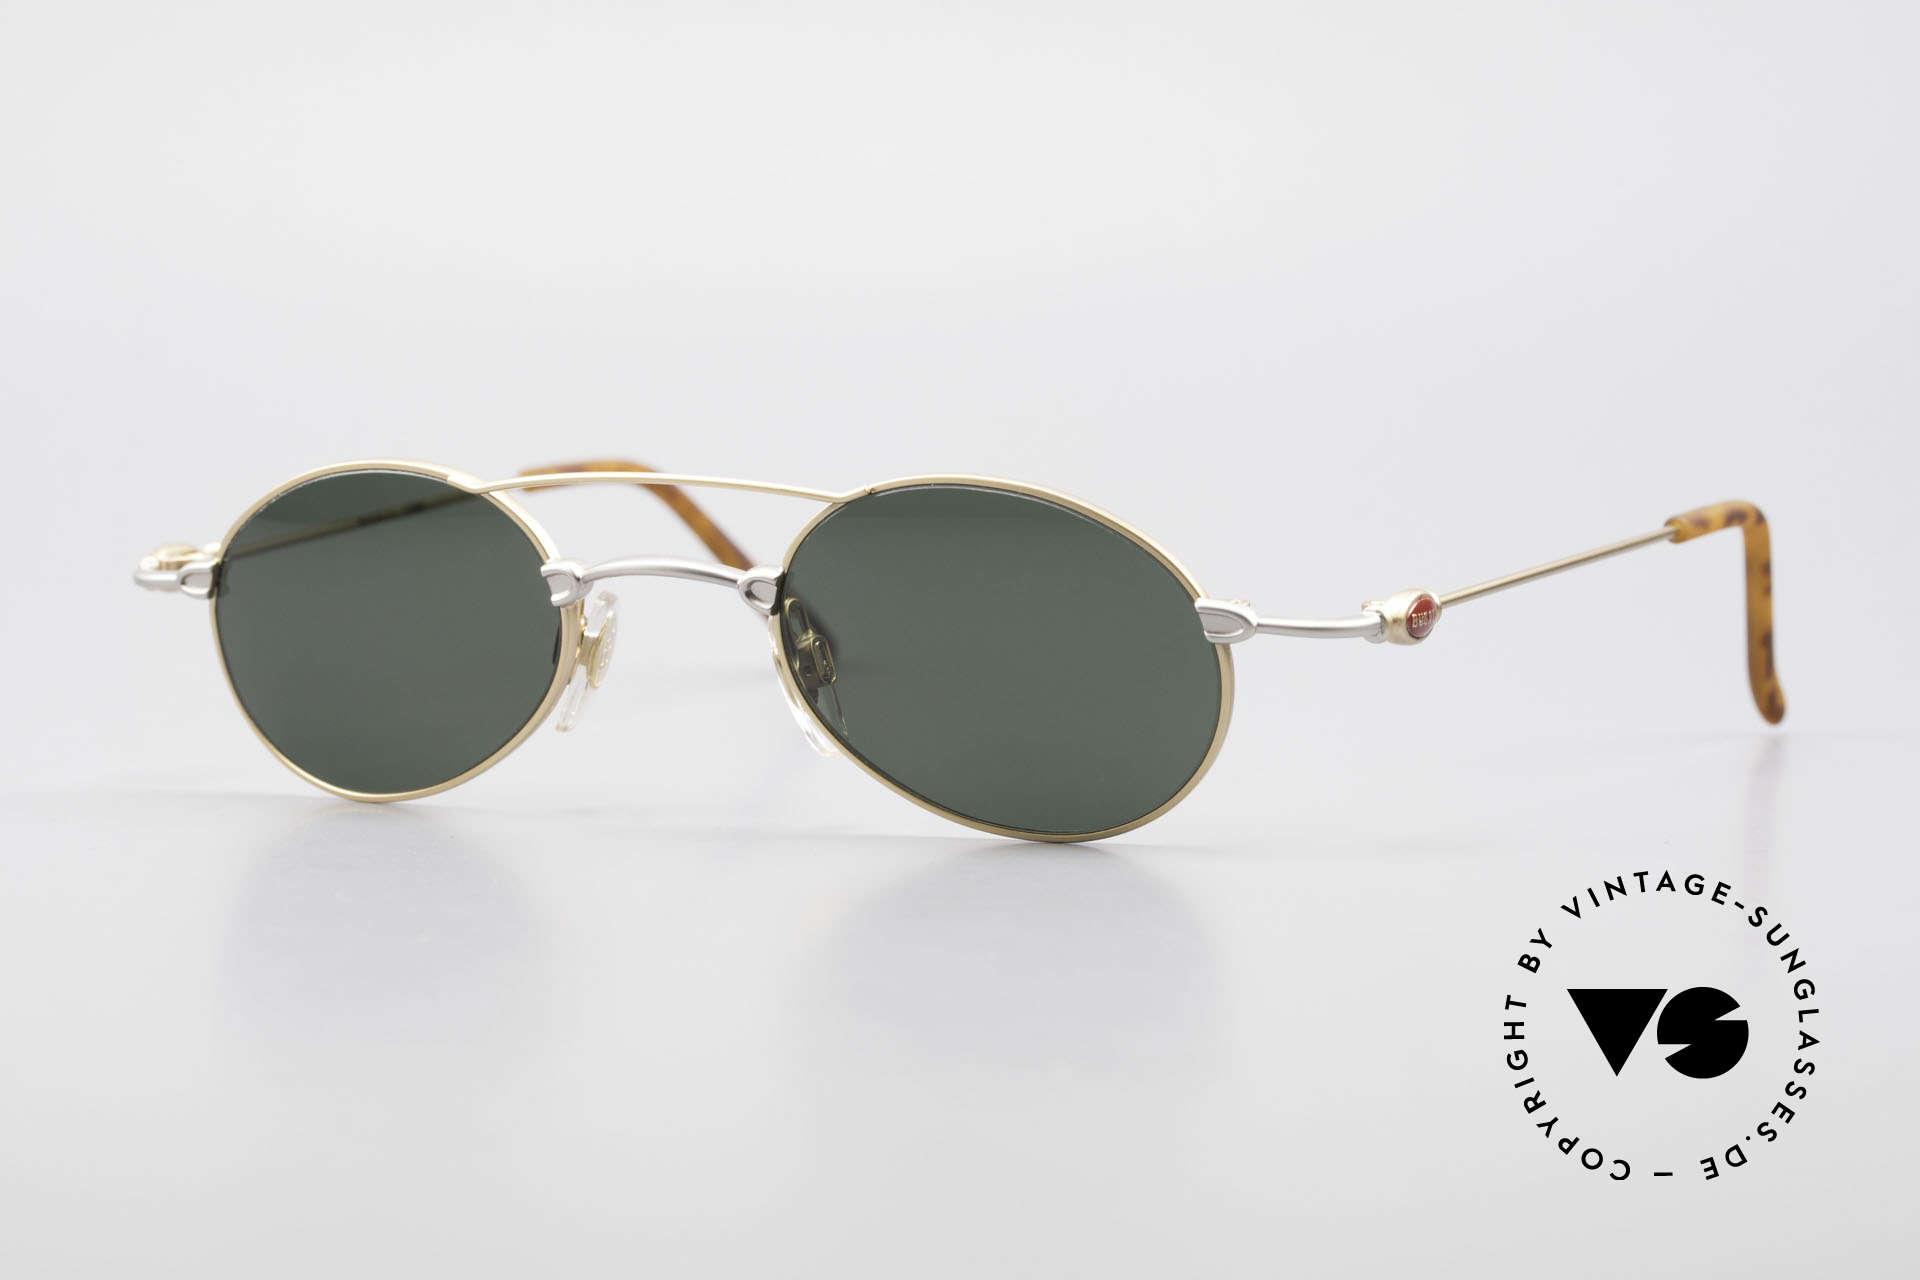 Bugatti 10868 Luxury Vintage Sunglasses Men, wispy & leightweight designer sunglasses by Bugatti, Made for Men